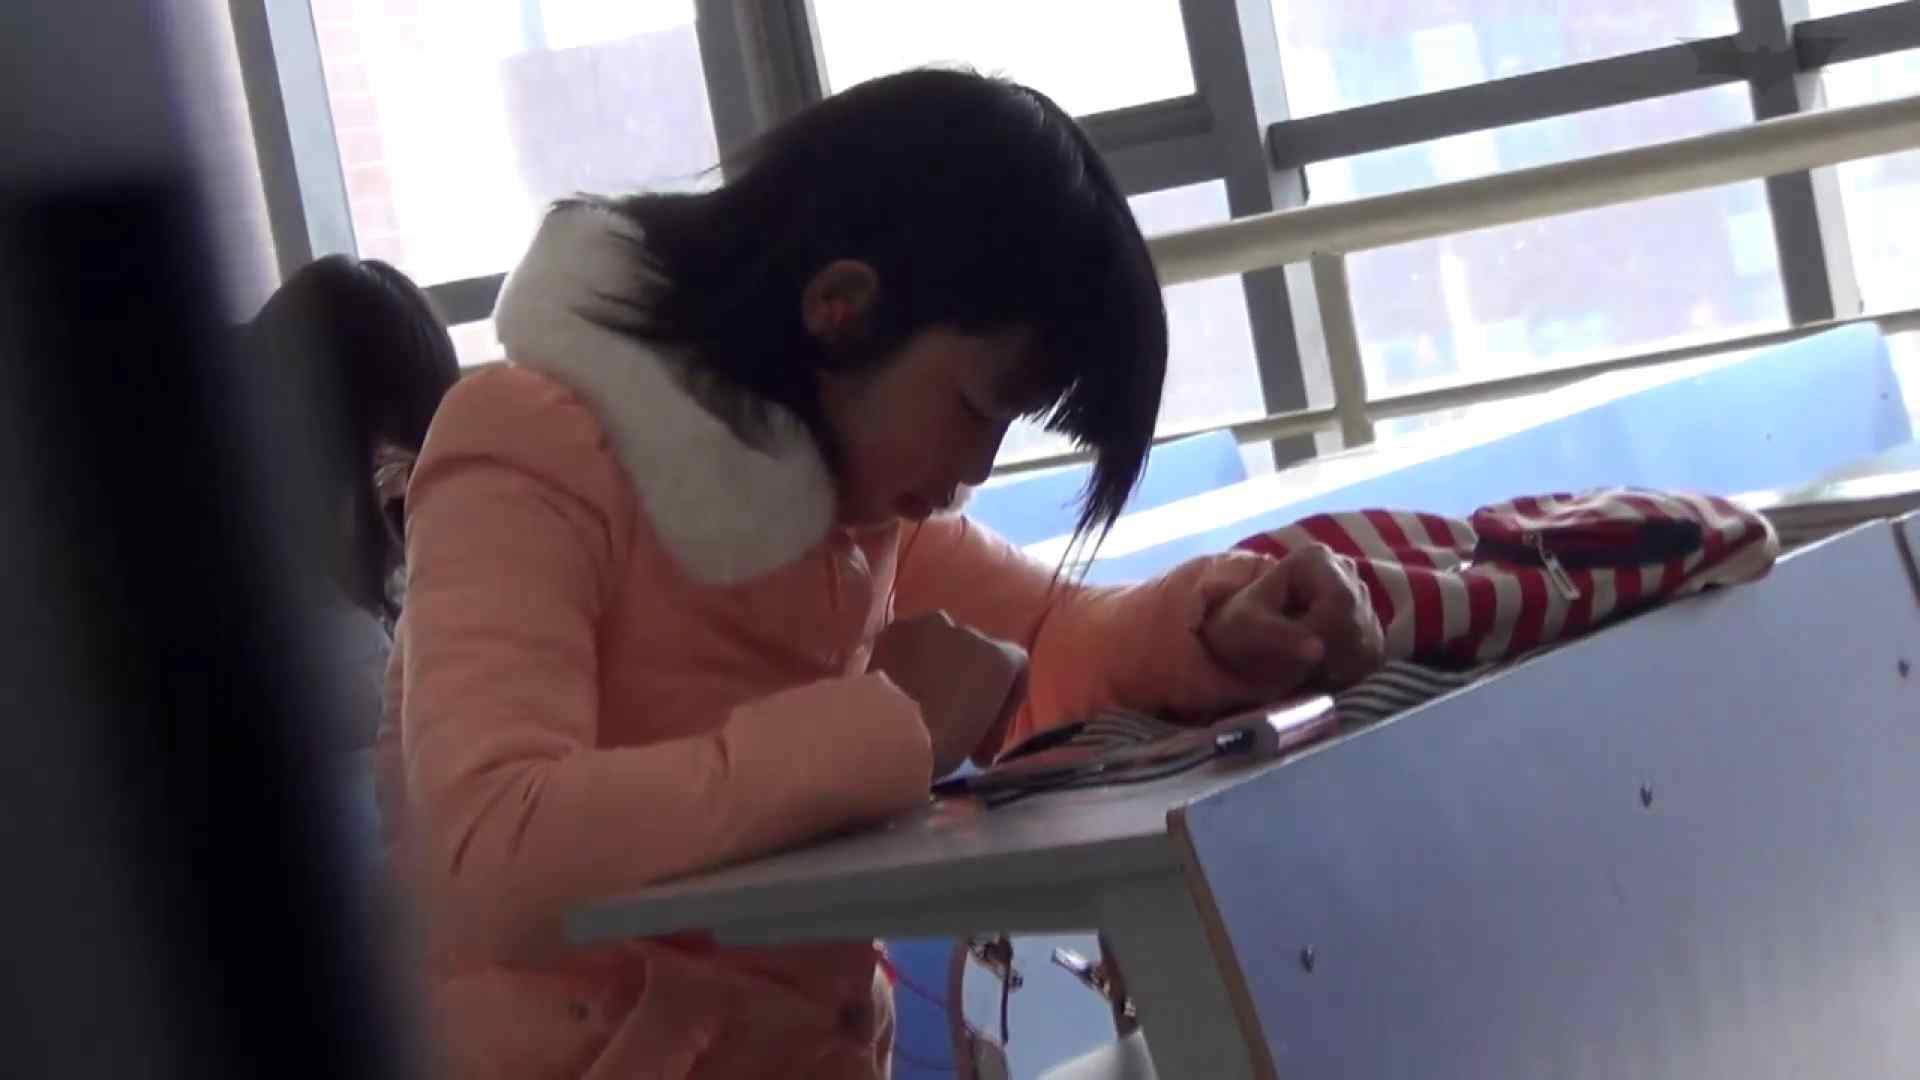 JD盗撮 美女の洗面所の秘密 Vol.44 丸見え アダルト動画キャプチャ 91枚 15